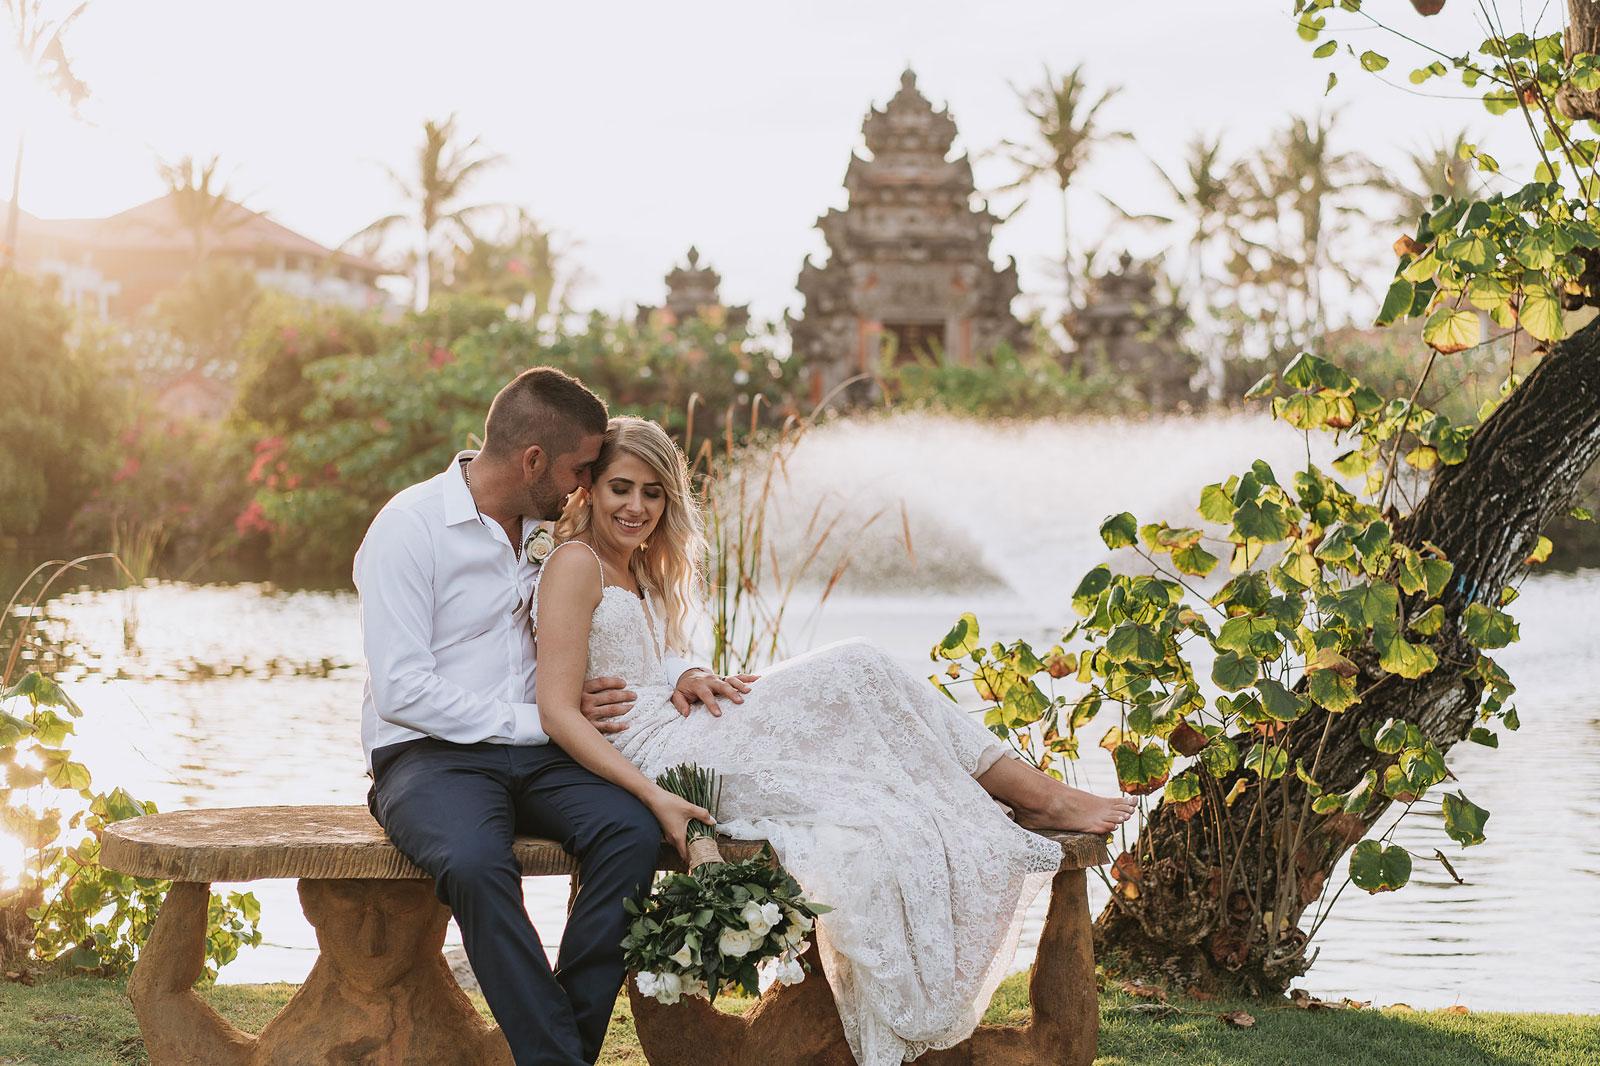 newfound-j-j-bali-nusa-dua-wedding-wedding-photographer-060-a